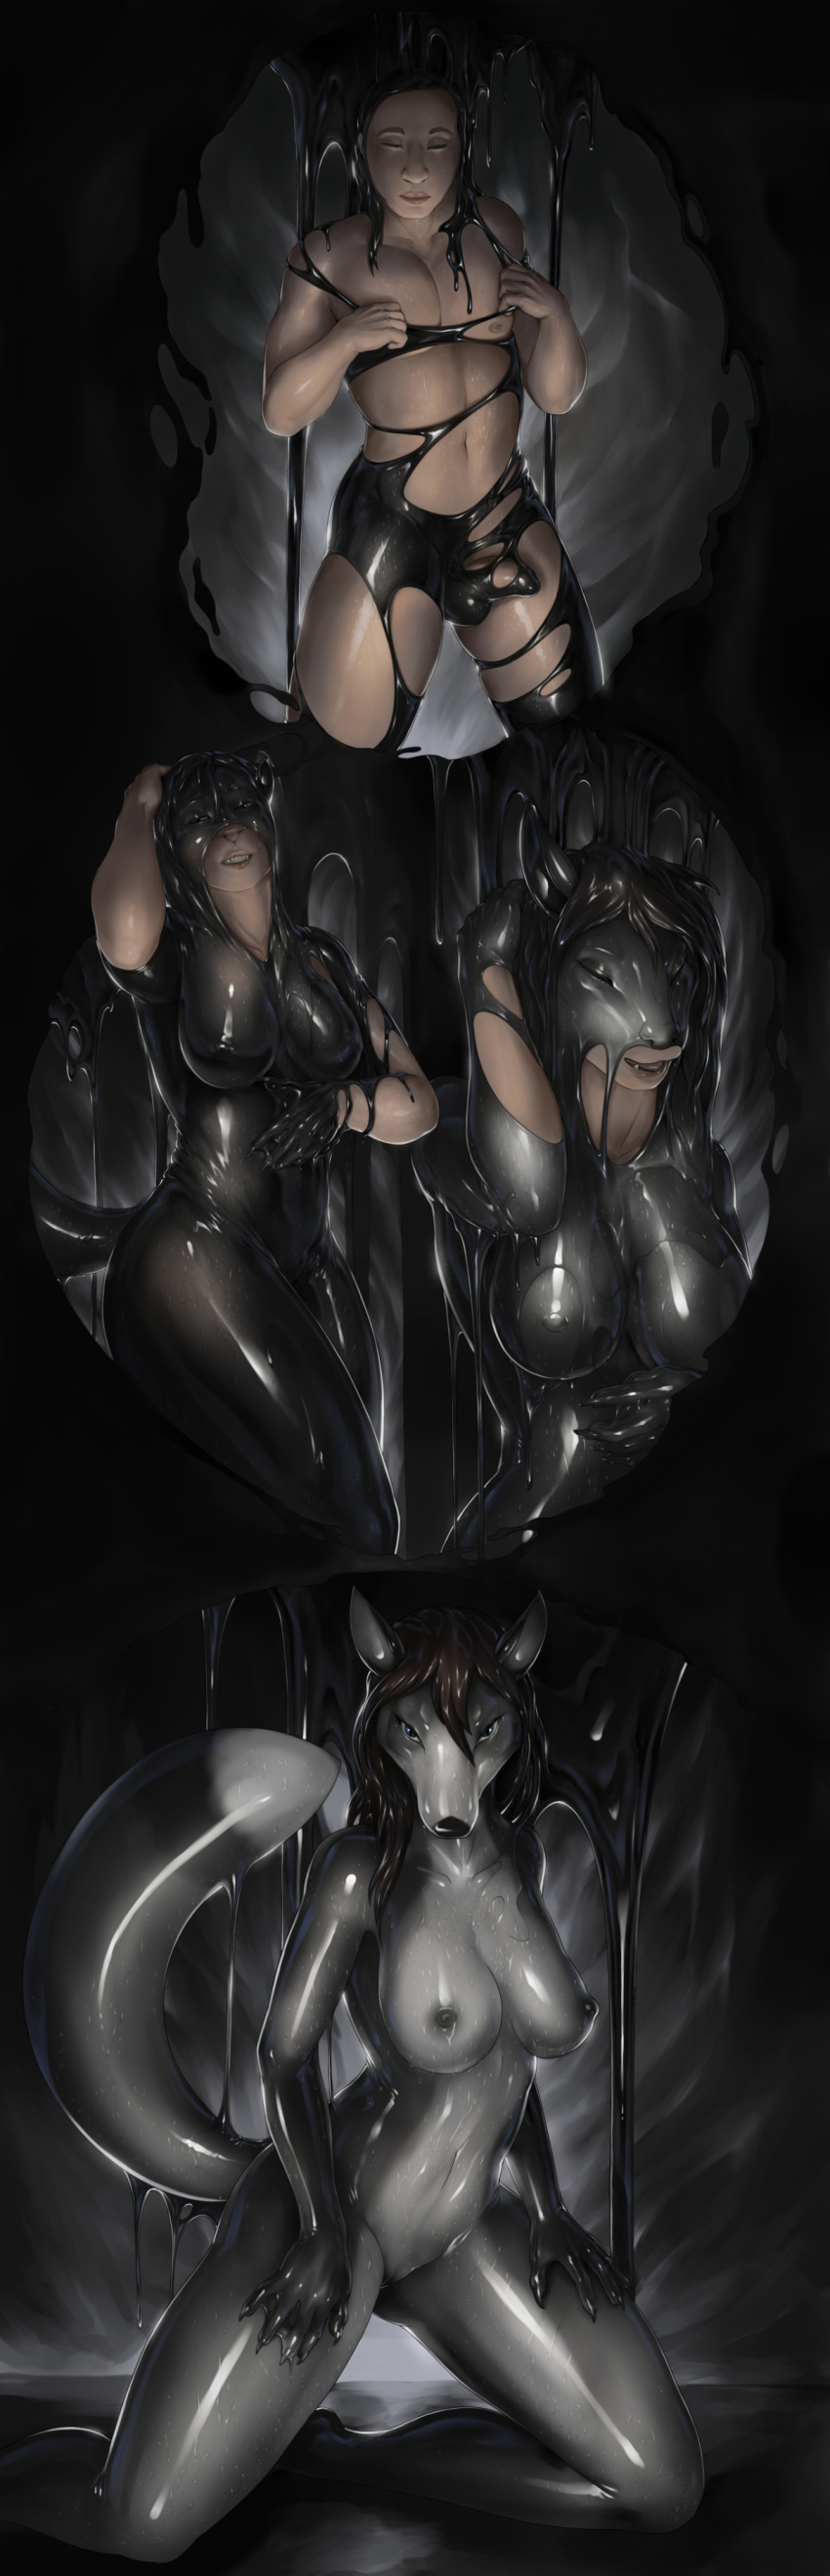 male transformation to female forced Gta v princess robot bubblegum car